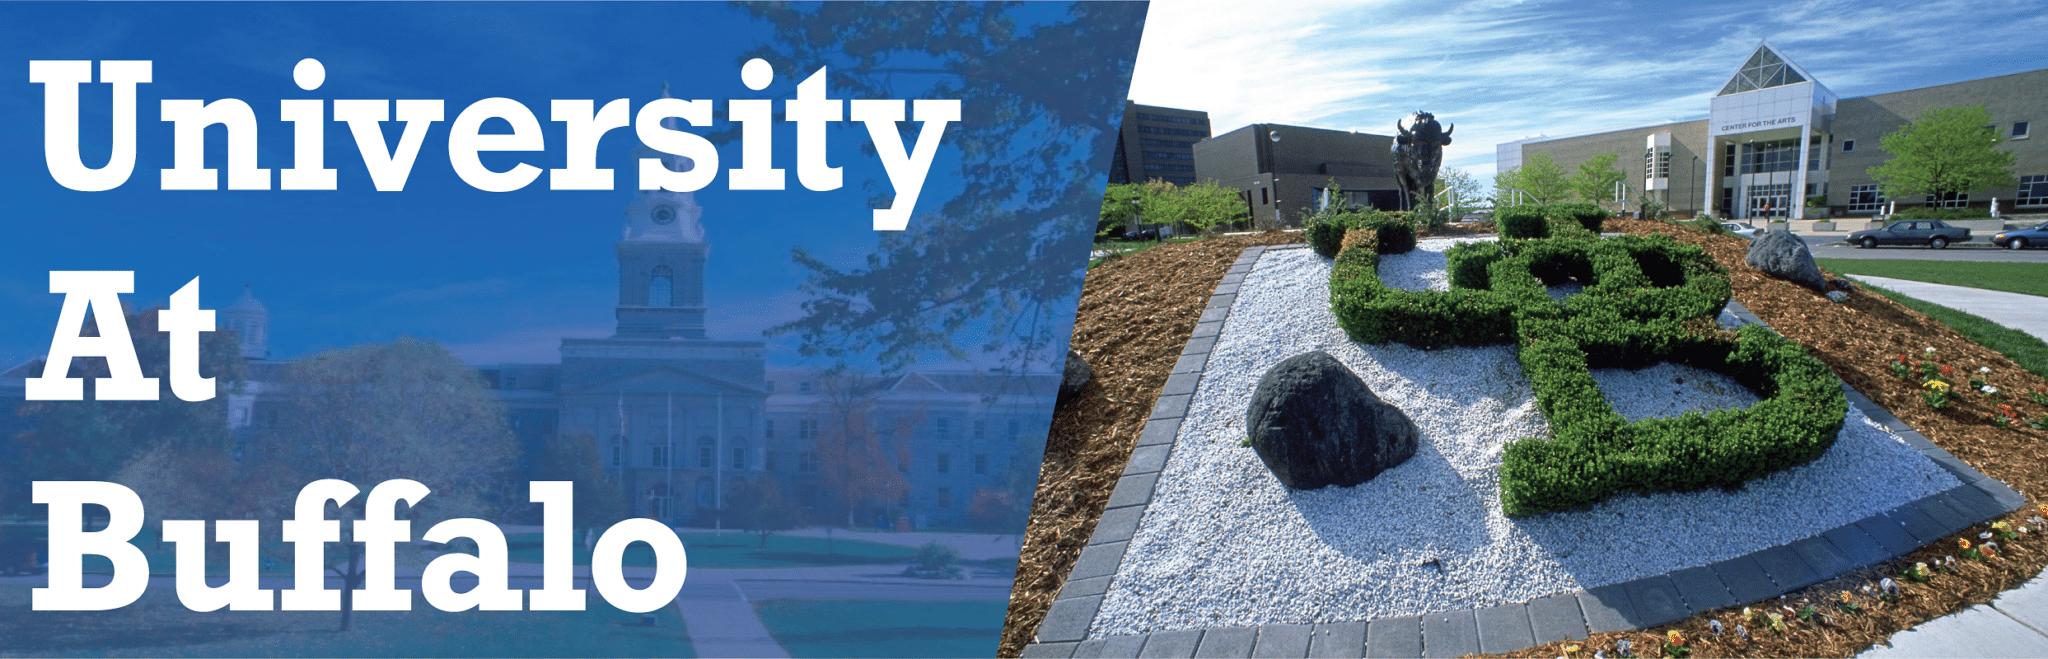 University of Buffalo - Banner